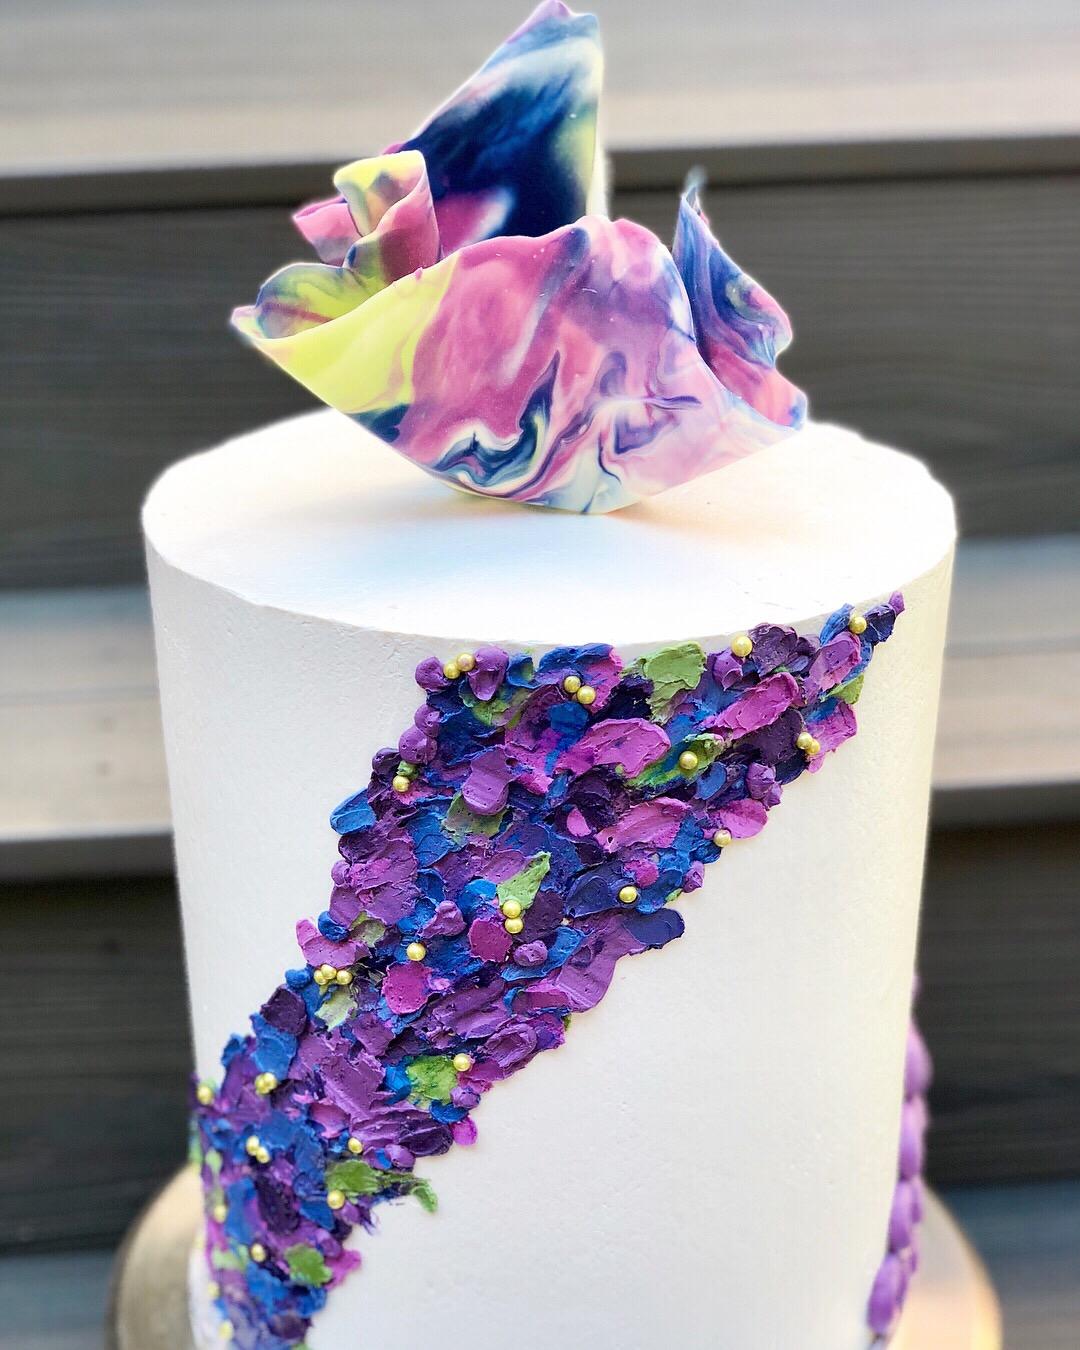 Stacey 50 cake.JPG